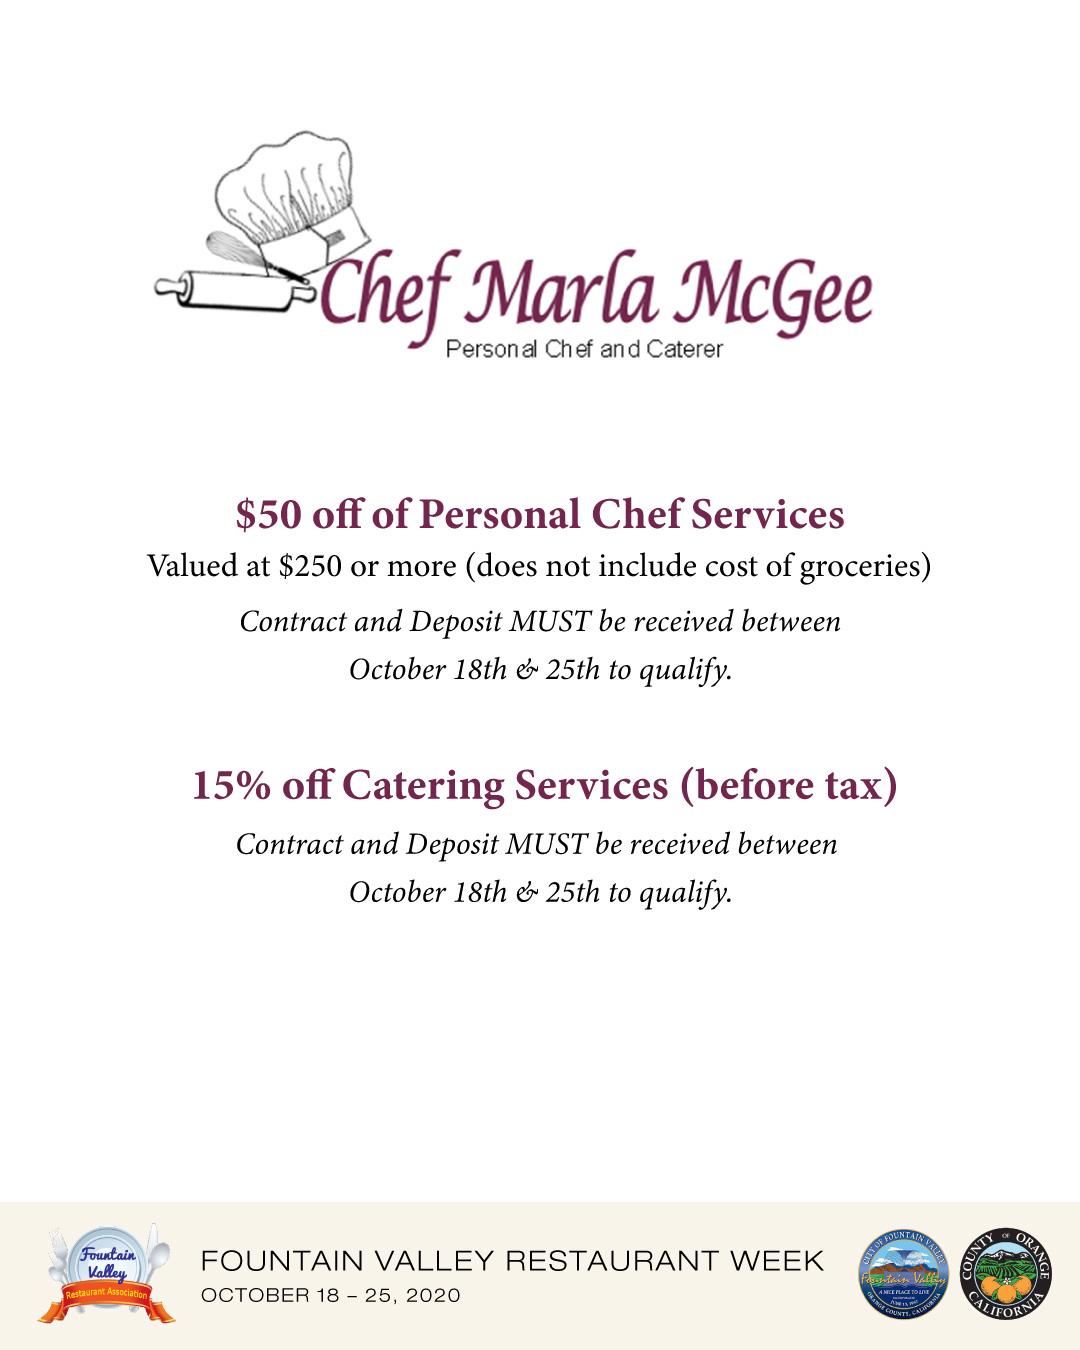 Chef Marla McGee, Inc.